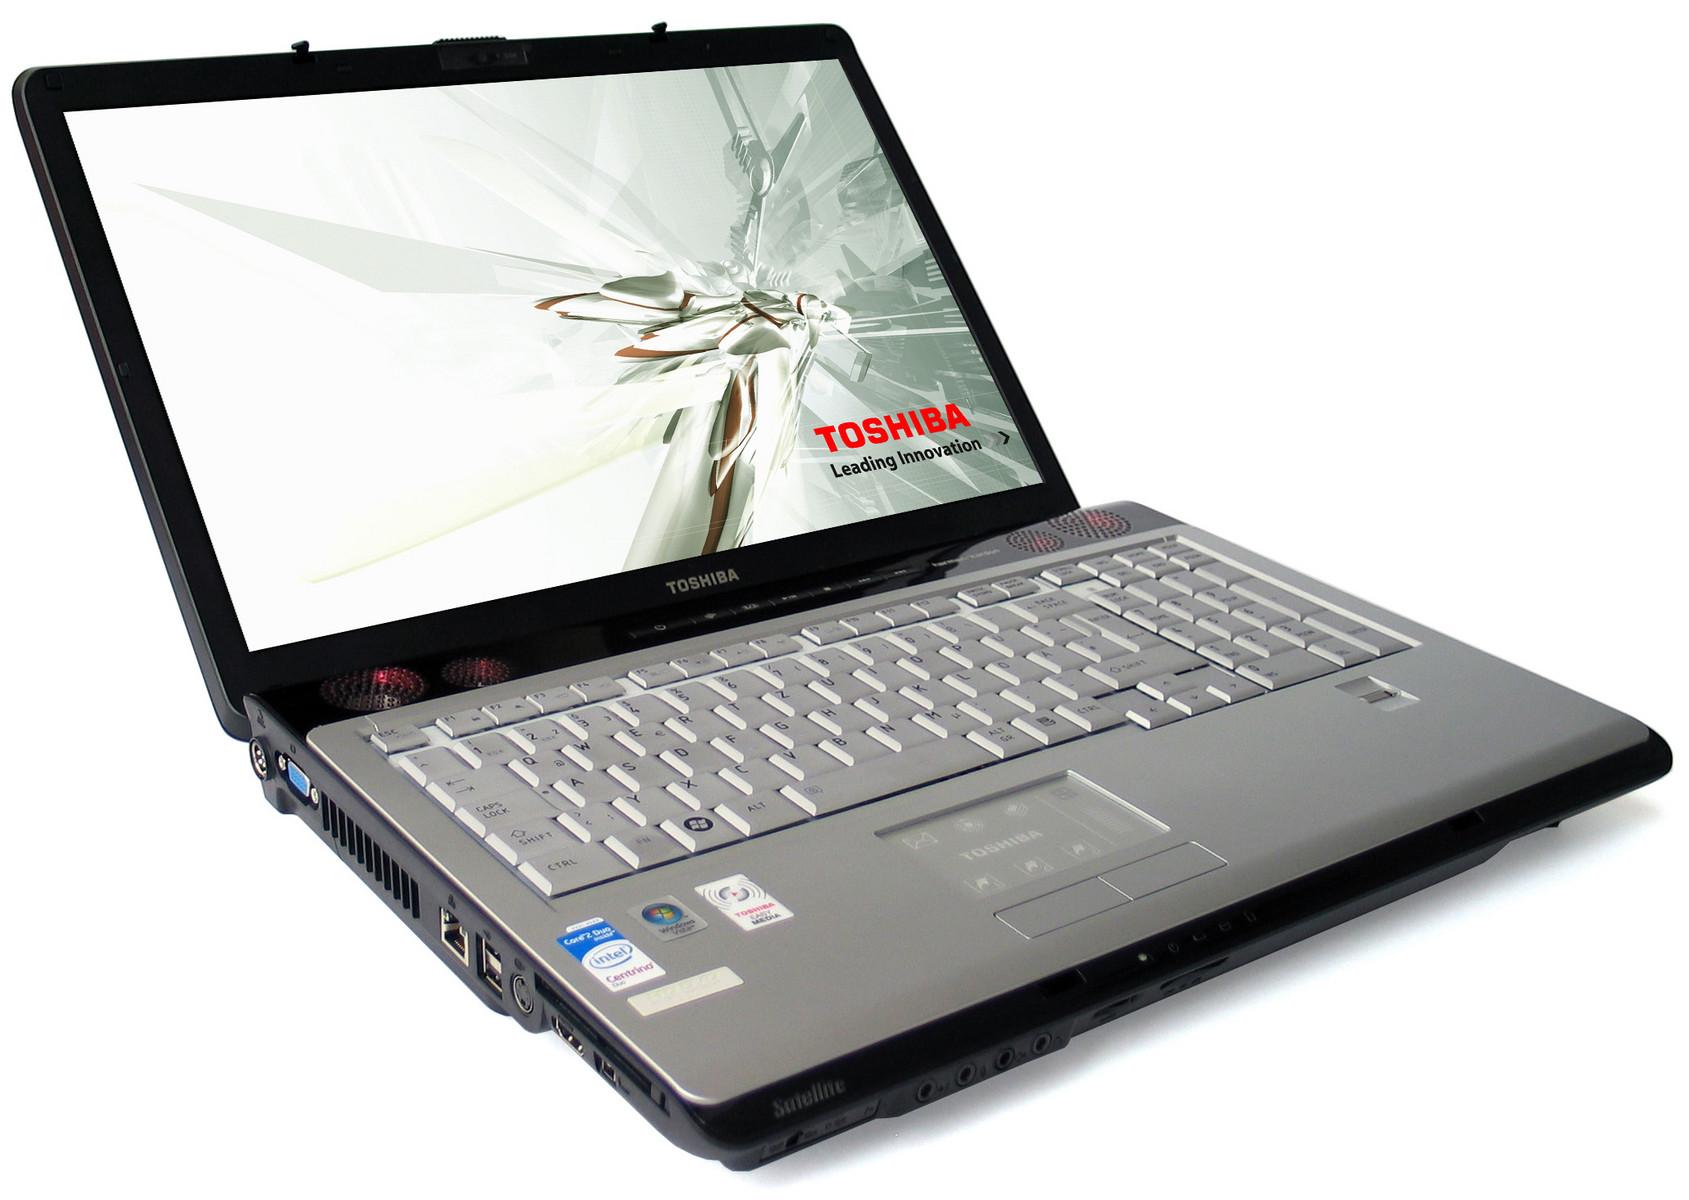 Toshiba Satellite X200-21X - Notebookcheck net External Reviews